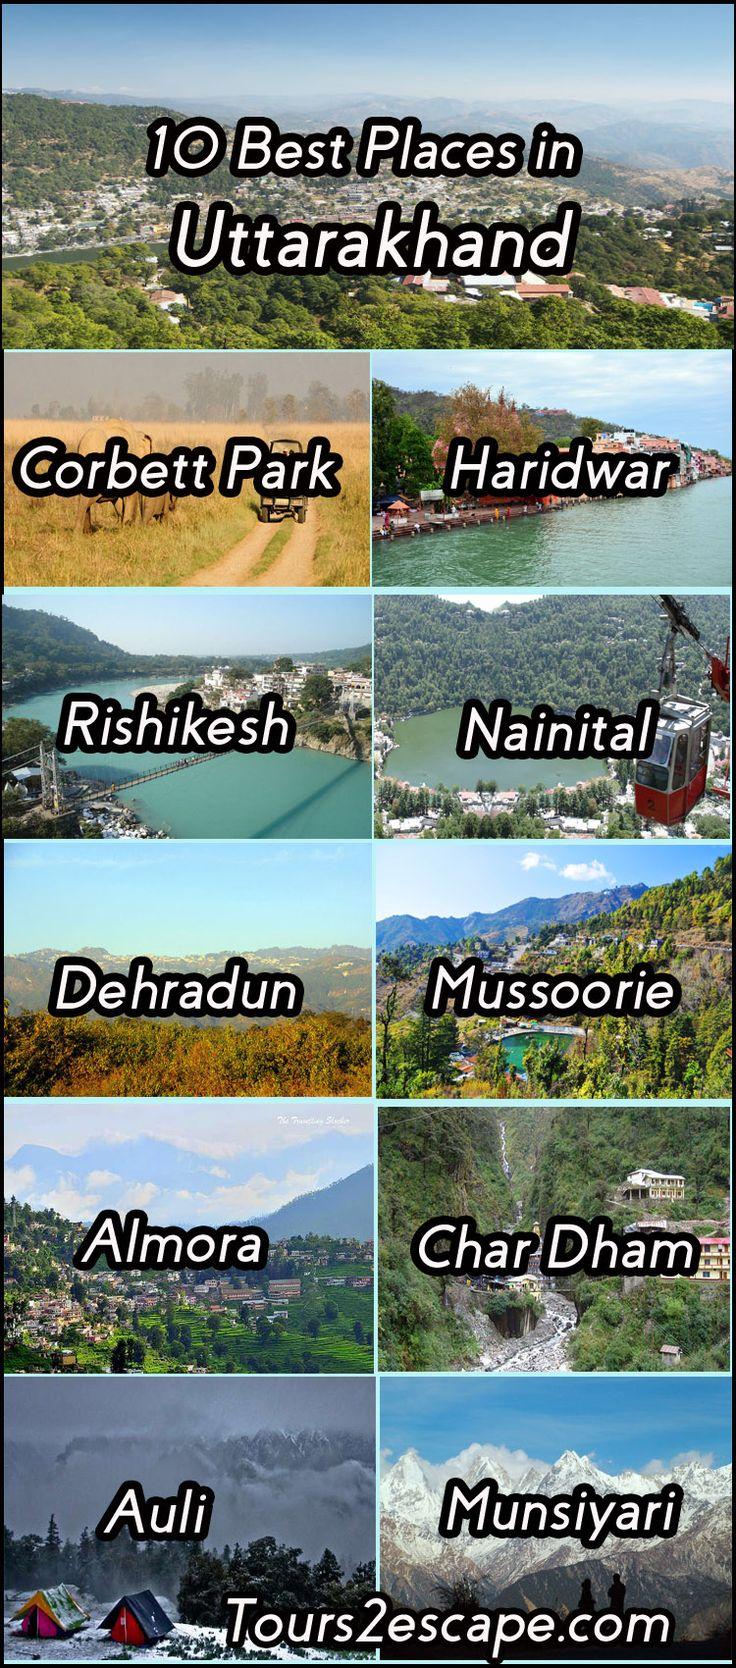 10 Best Places in Uttarakhand  #CorbettNationalPark #Haridwar #Rishikesh #Nainital #Dehradun #Mussoorie #Almora #CharDham #Auli #Munsiyari  http://www.tours2escape.com/10-best-places-in-uttarakhand/